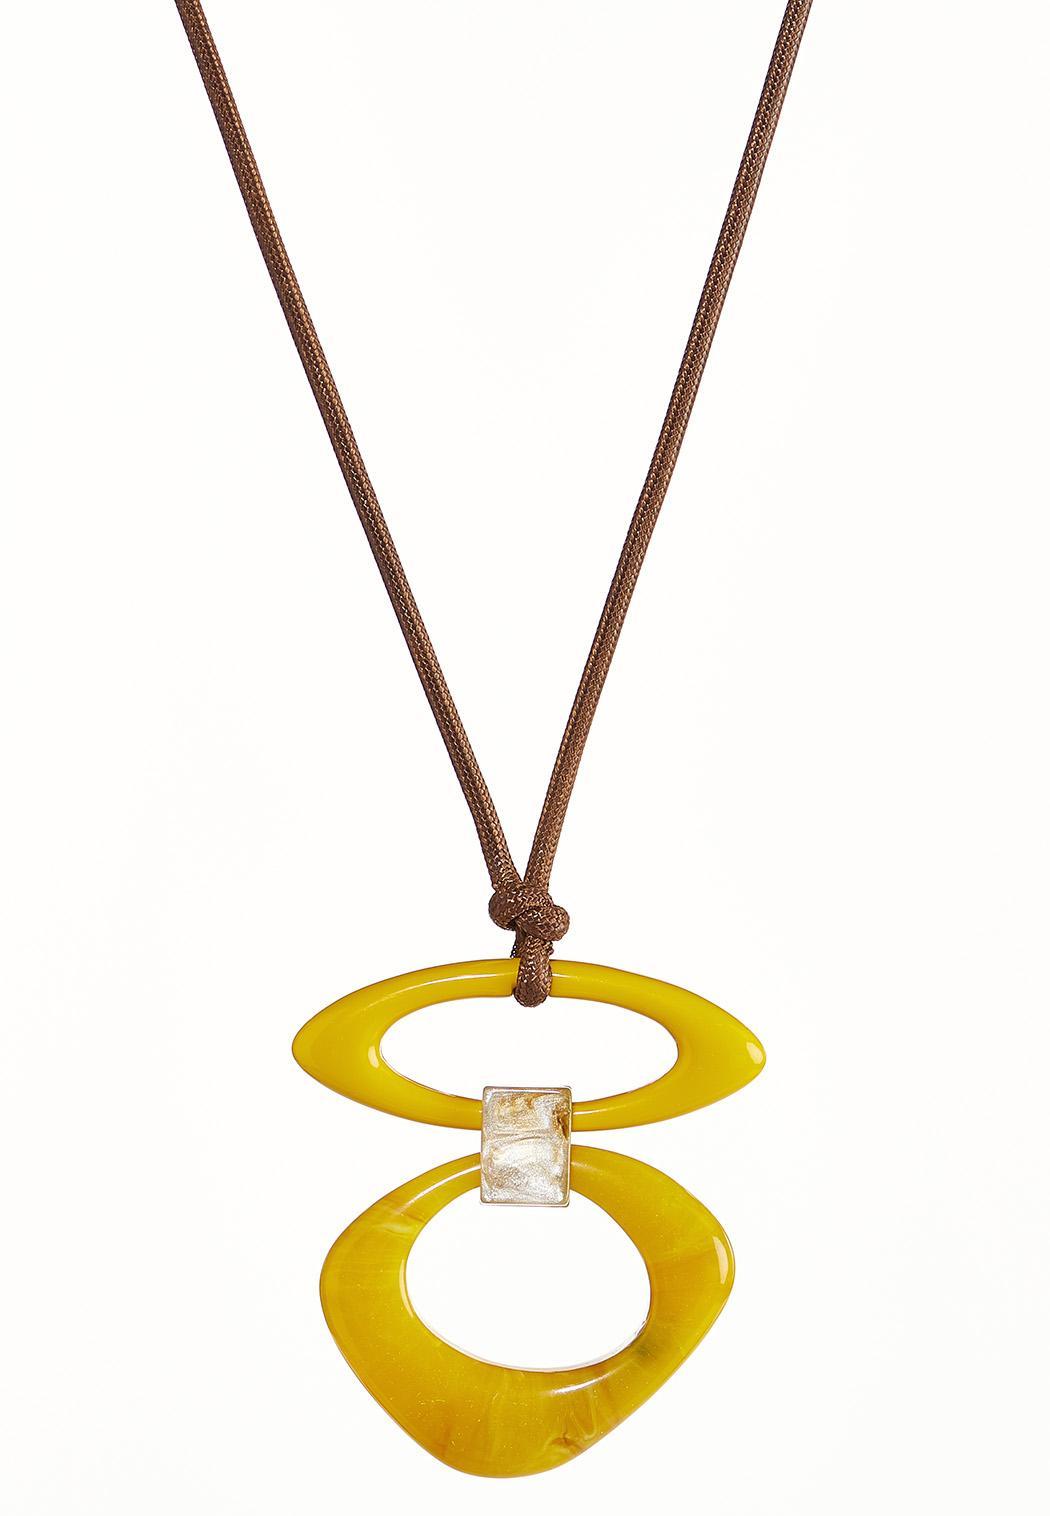 Oversized Resin Pendant Necklace